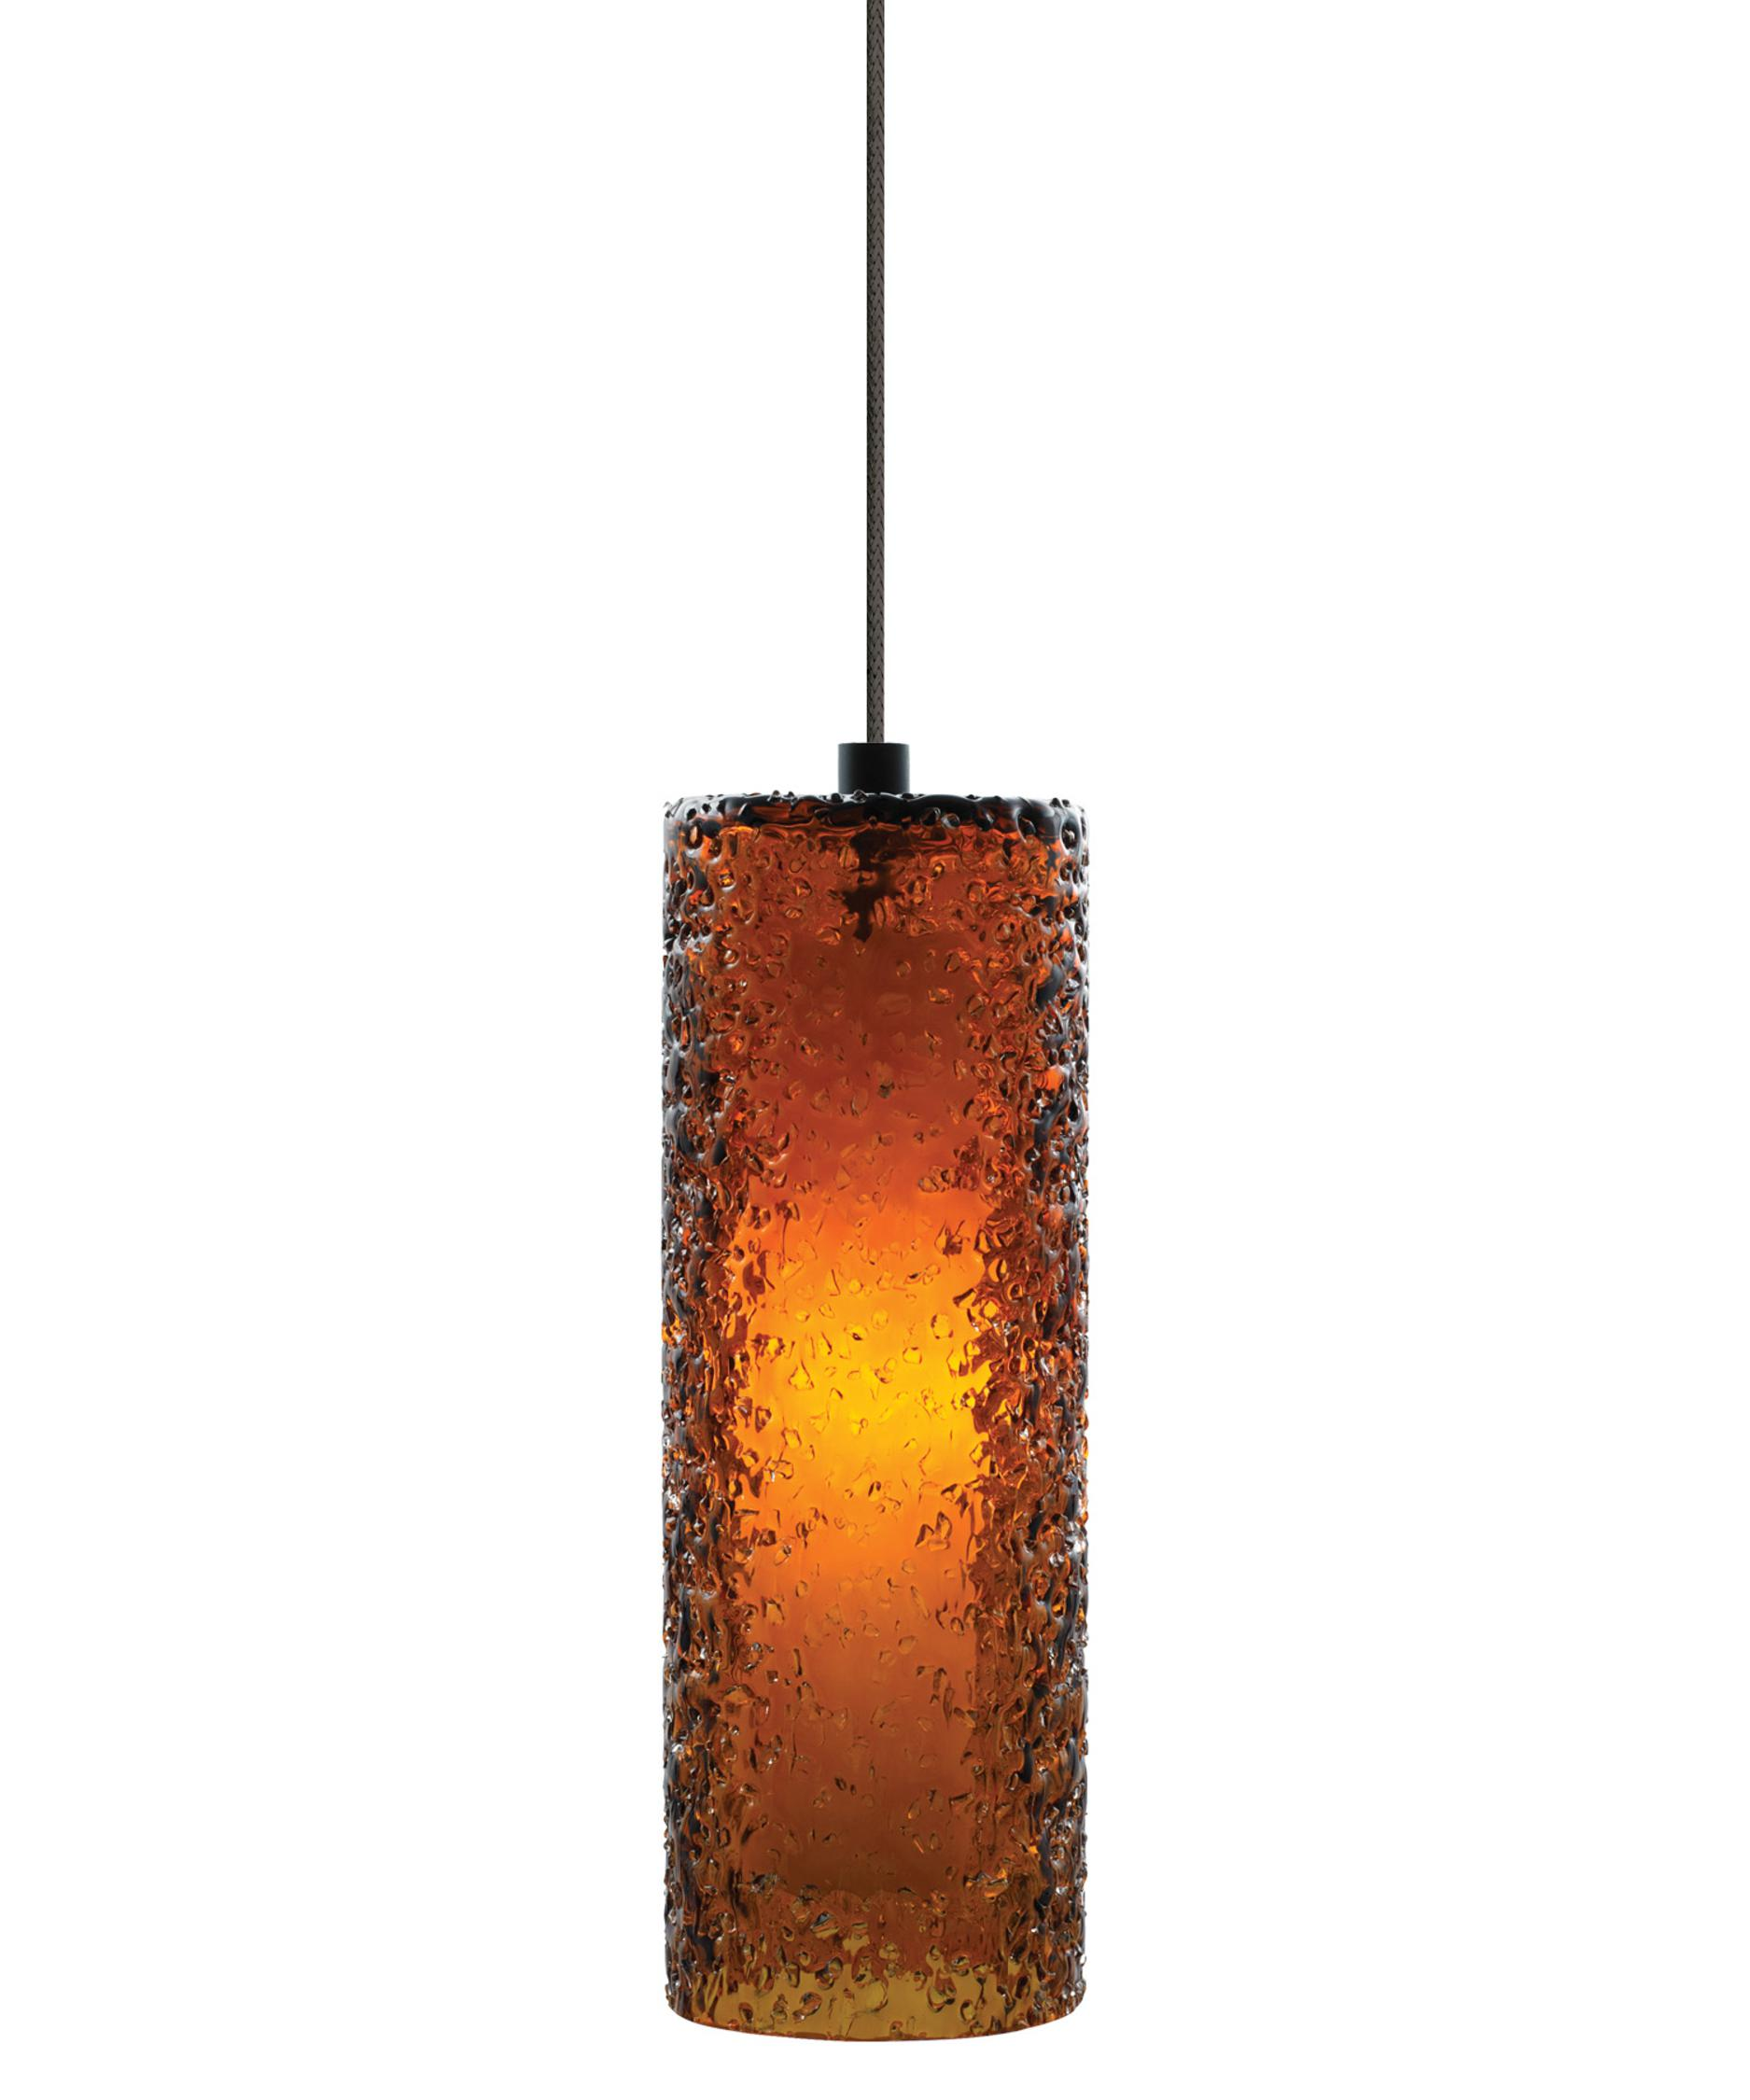 amber pendant lighting. shown with dark amber glass pendant lighting r